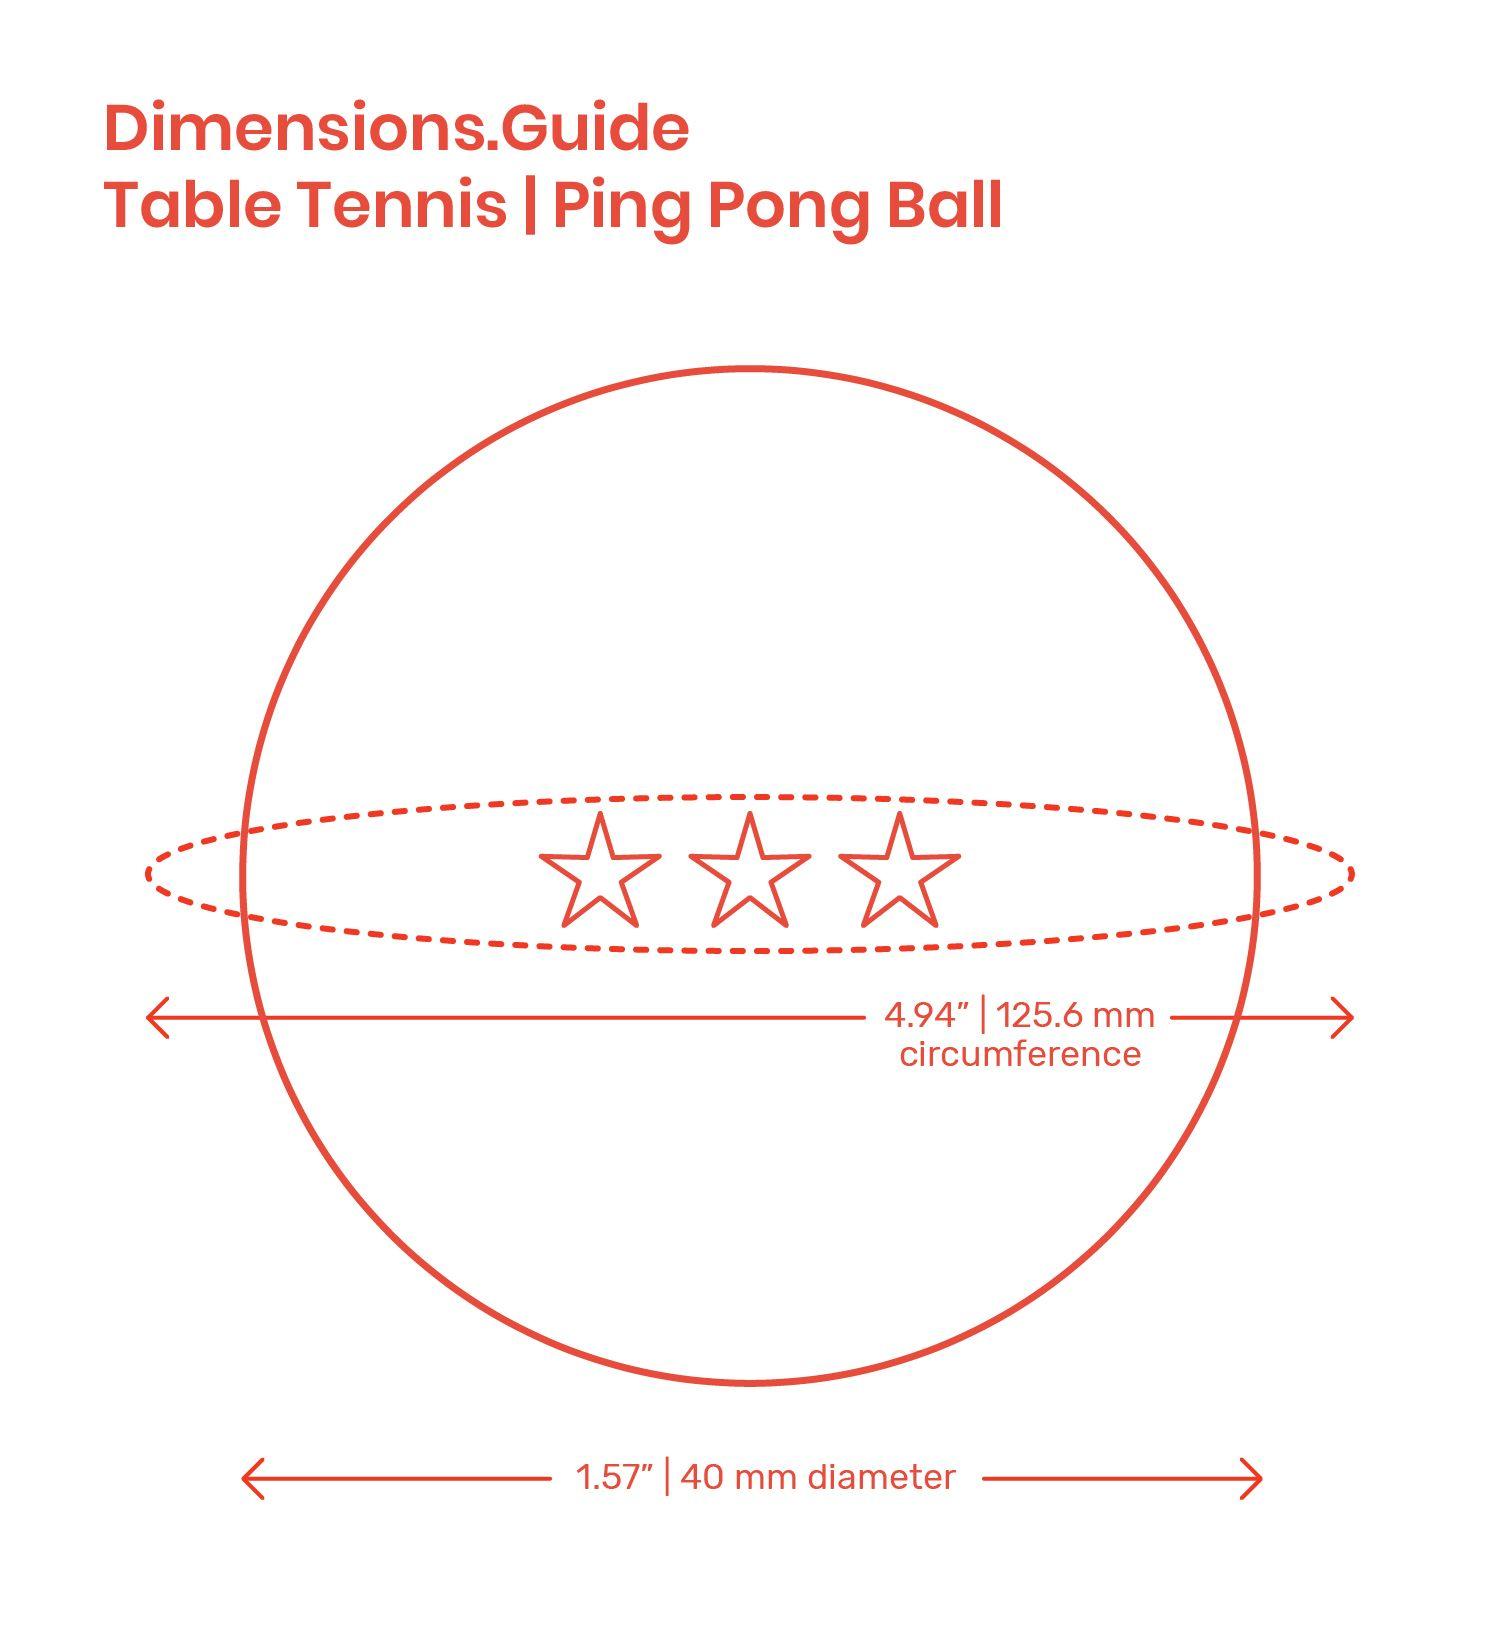 Table Tennis Ping Pong Balls Table Tennis Ping Pong Ping Pong Balls